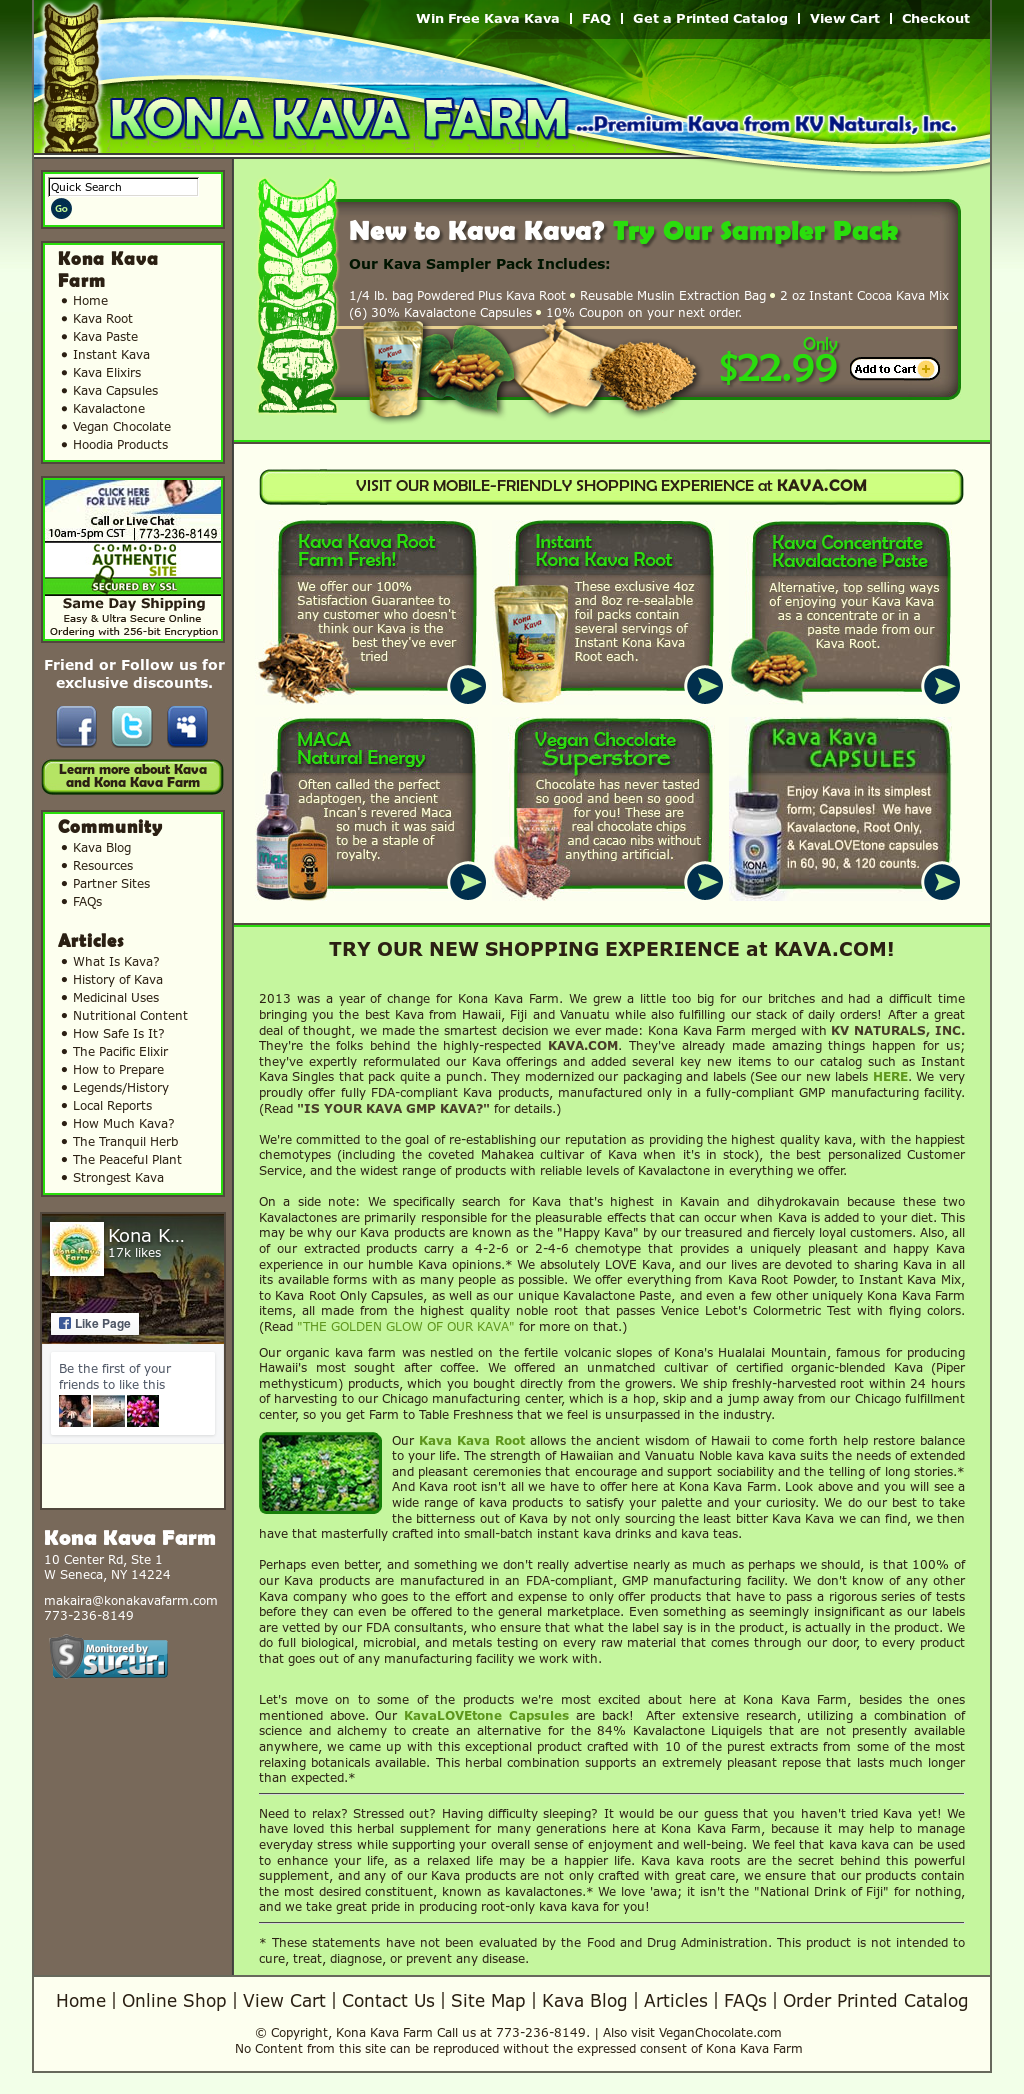 Kona Kava Farm Competitors, Revenue and Employees - Owler